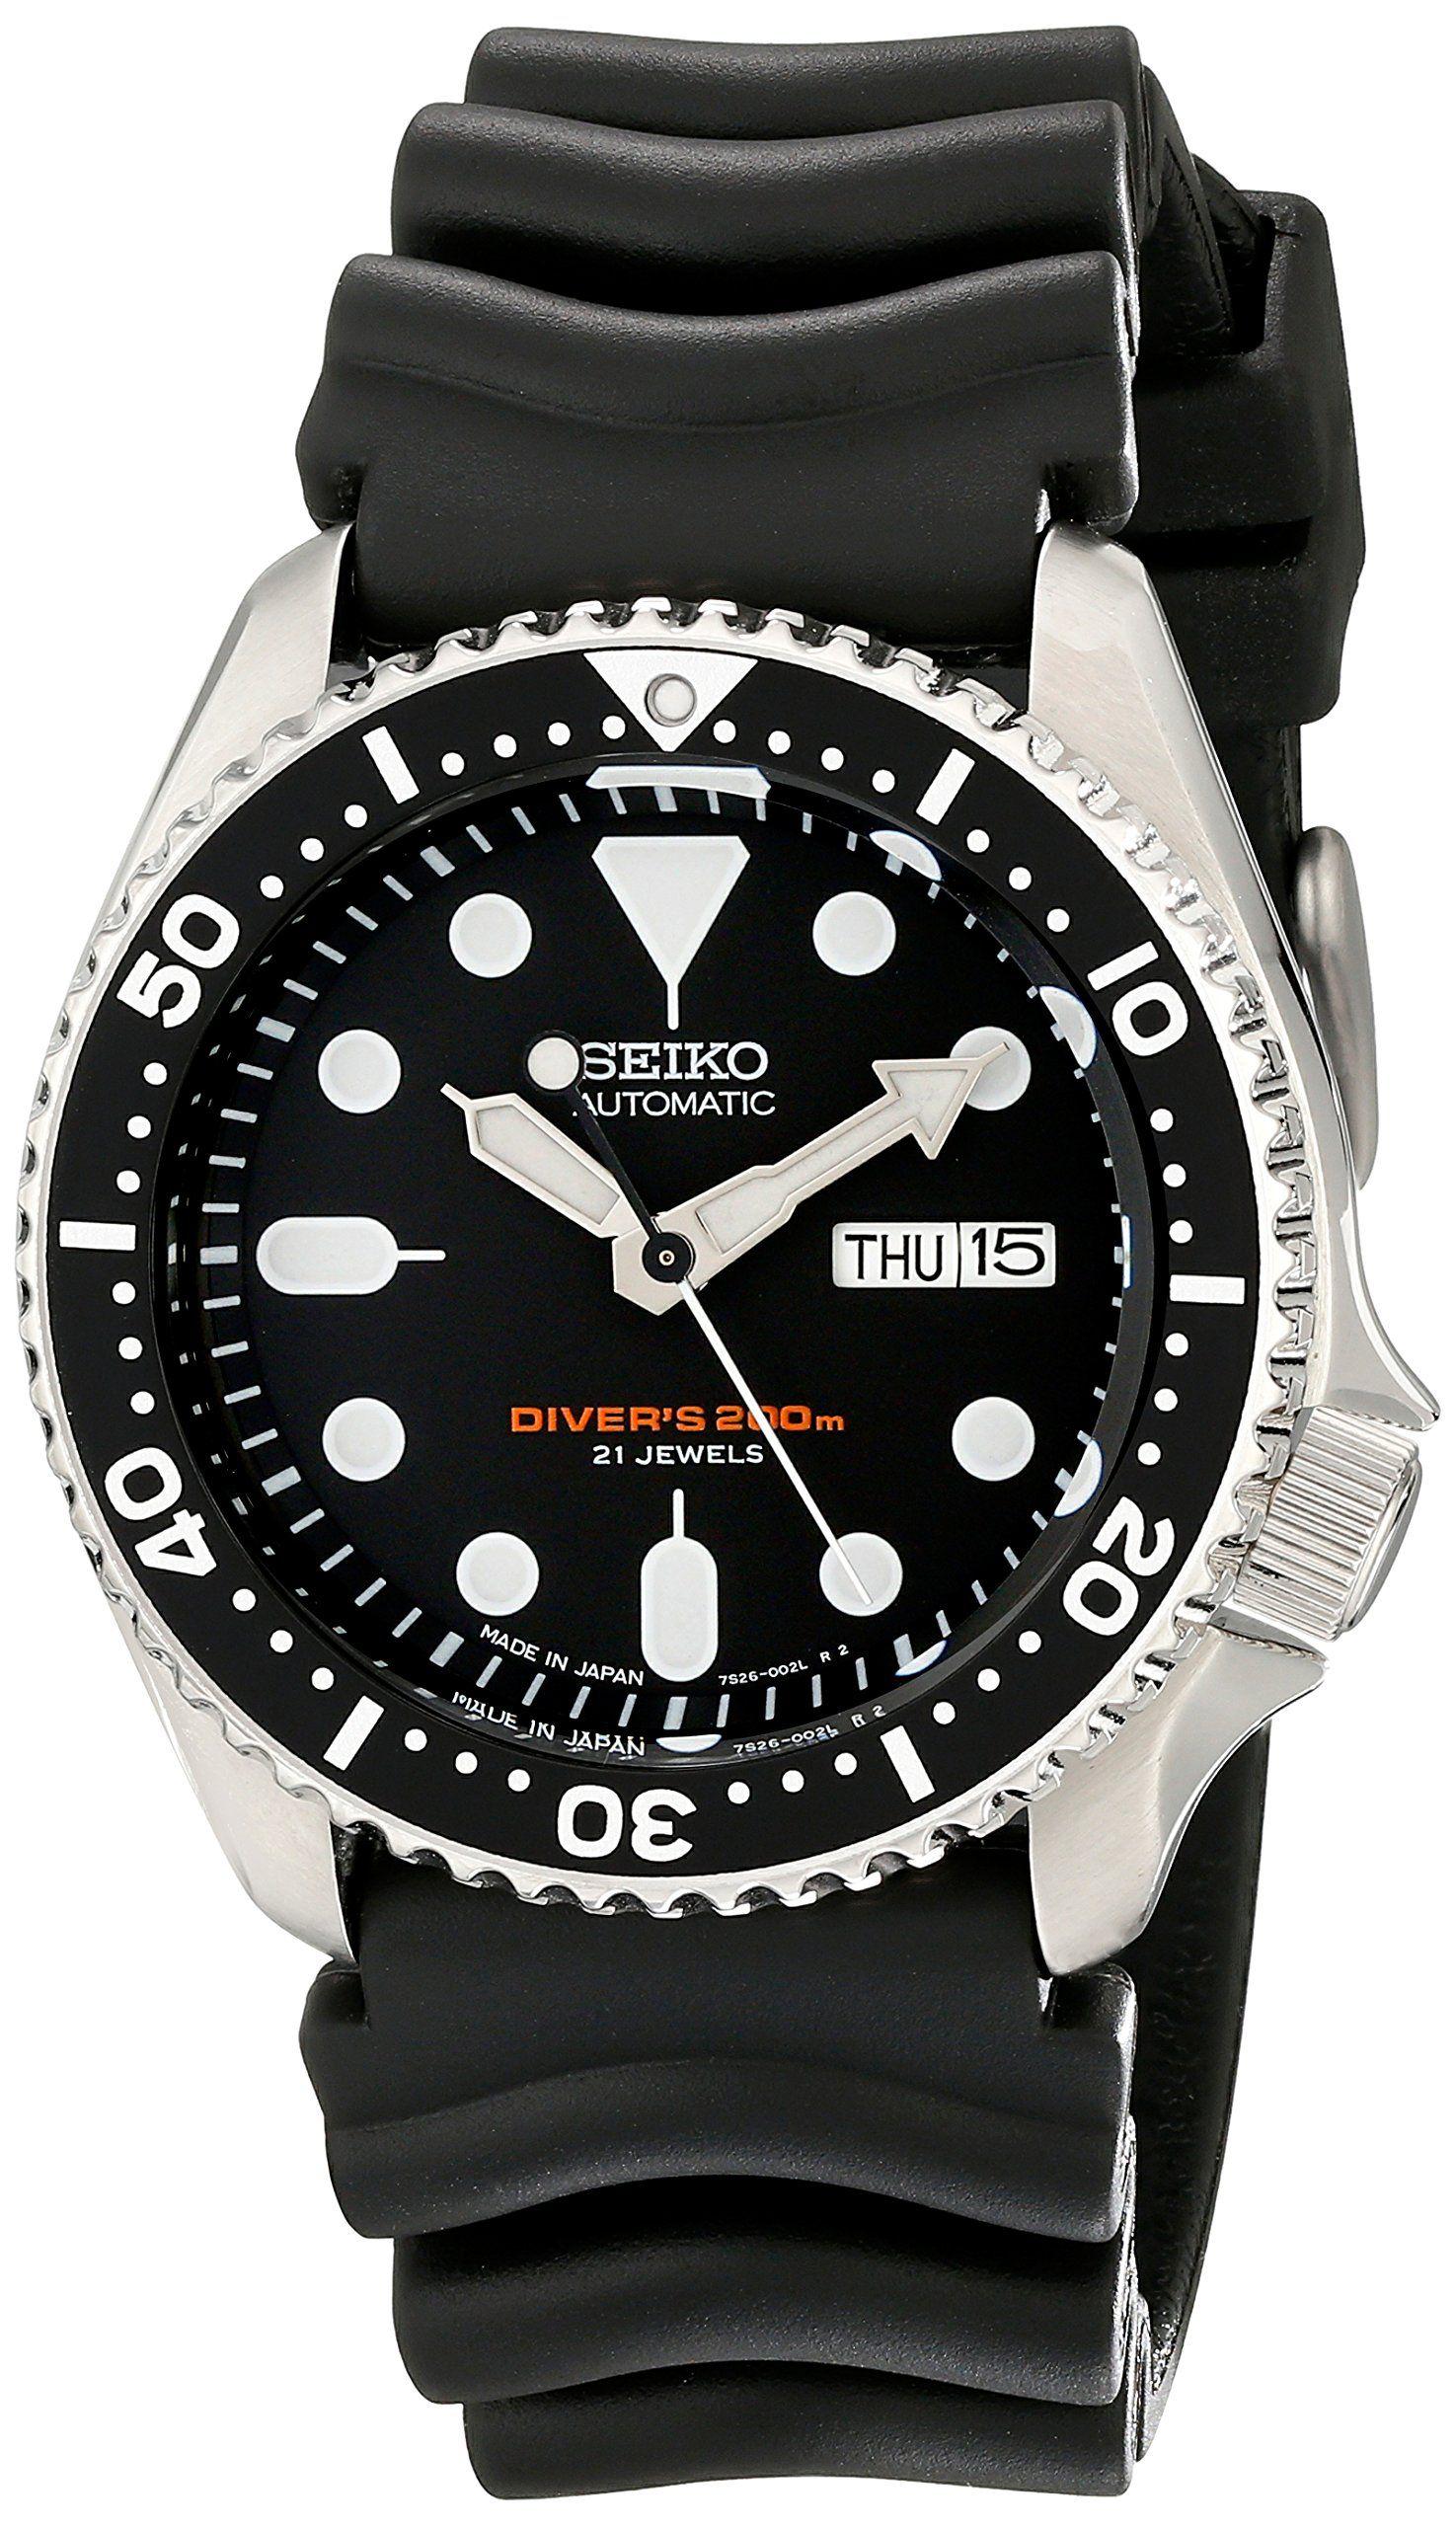 742fa5ade3d Seiko Automatic Diver s SKX007J1 SKX007J SKX007 200m Made in Japan Watch